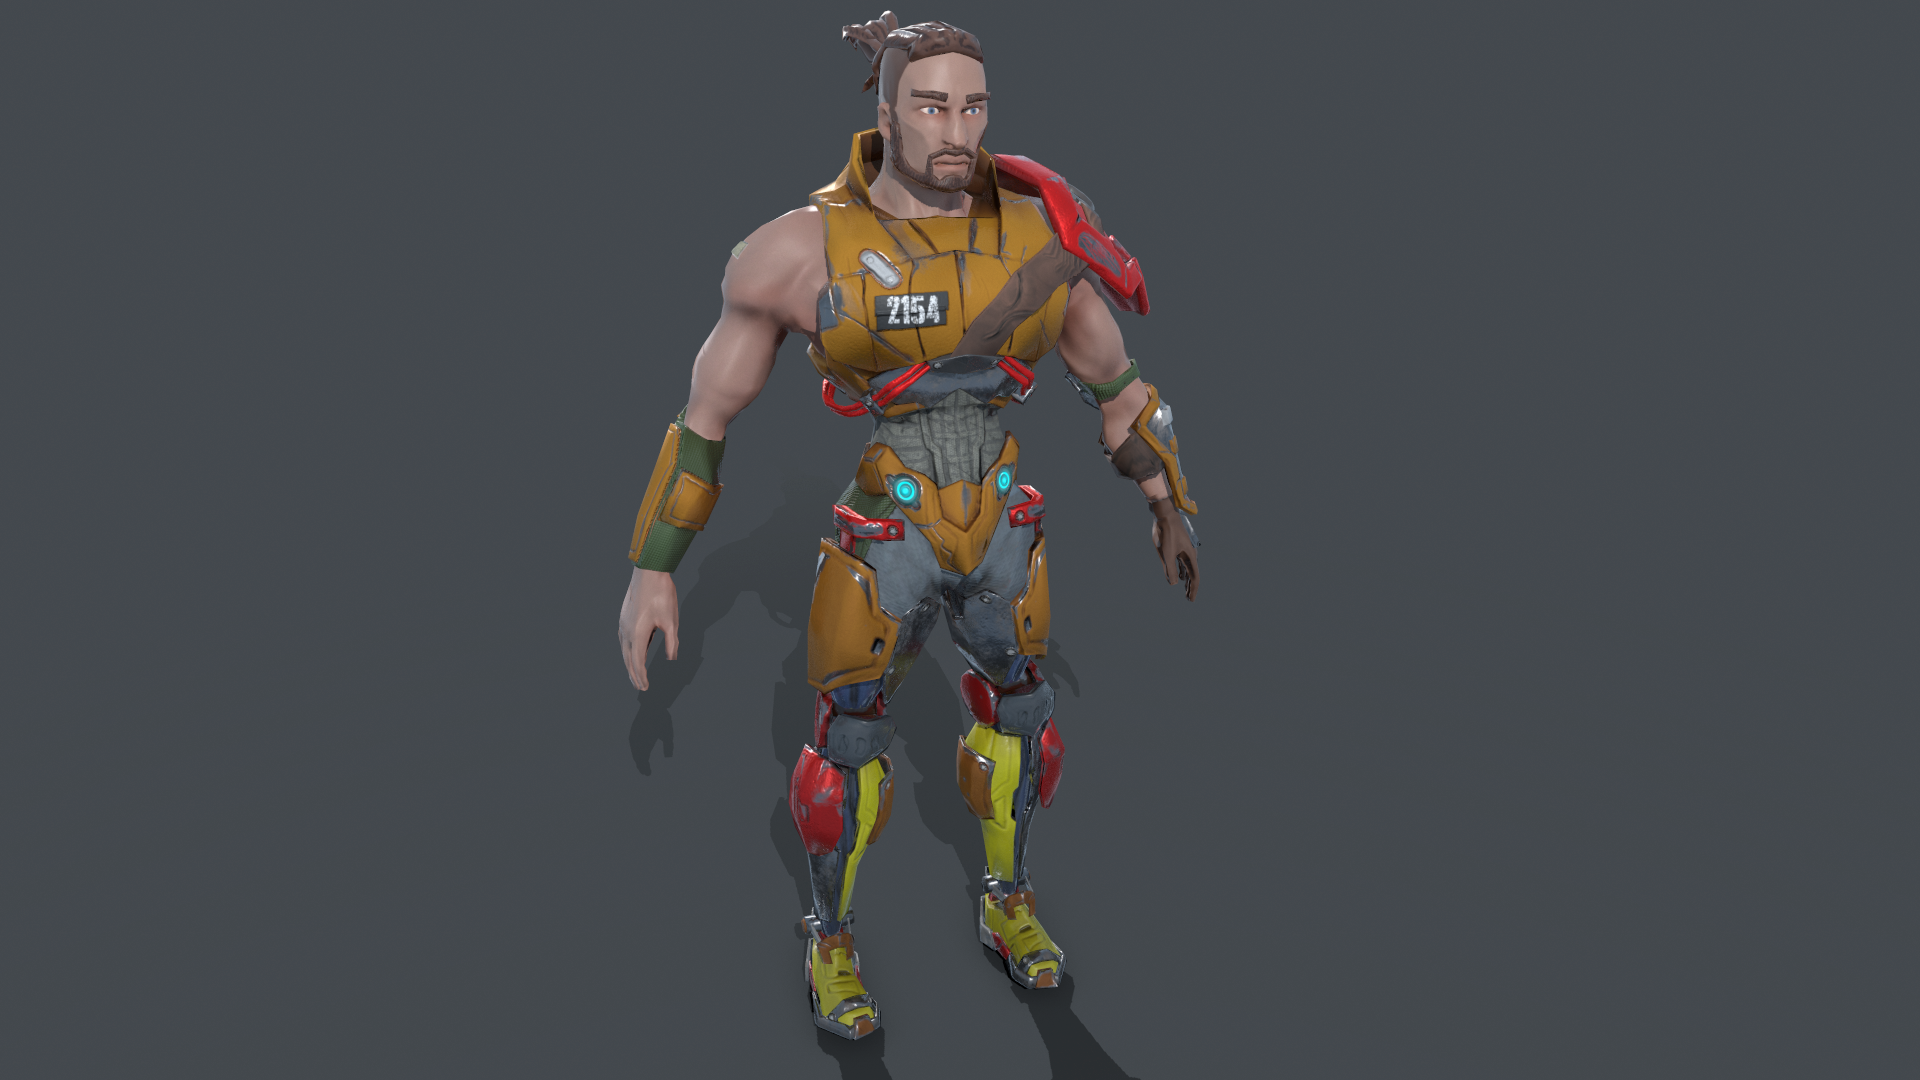 Warrior V3